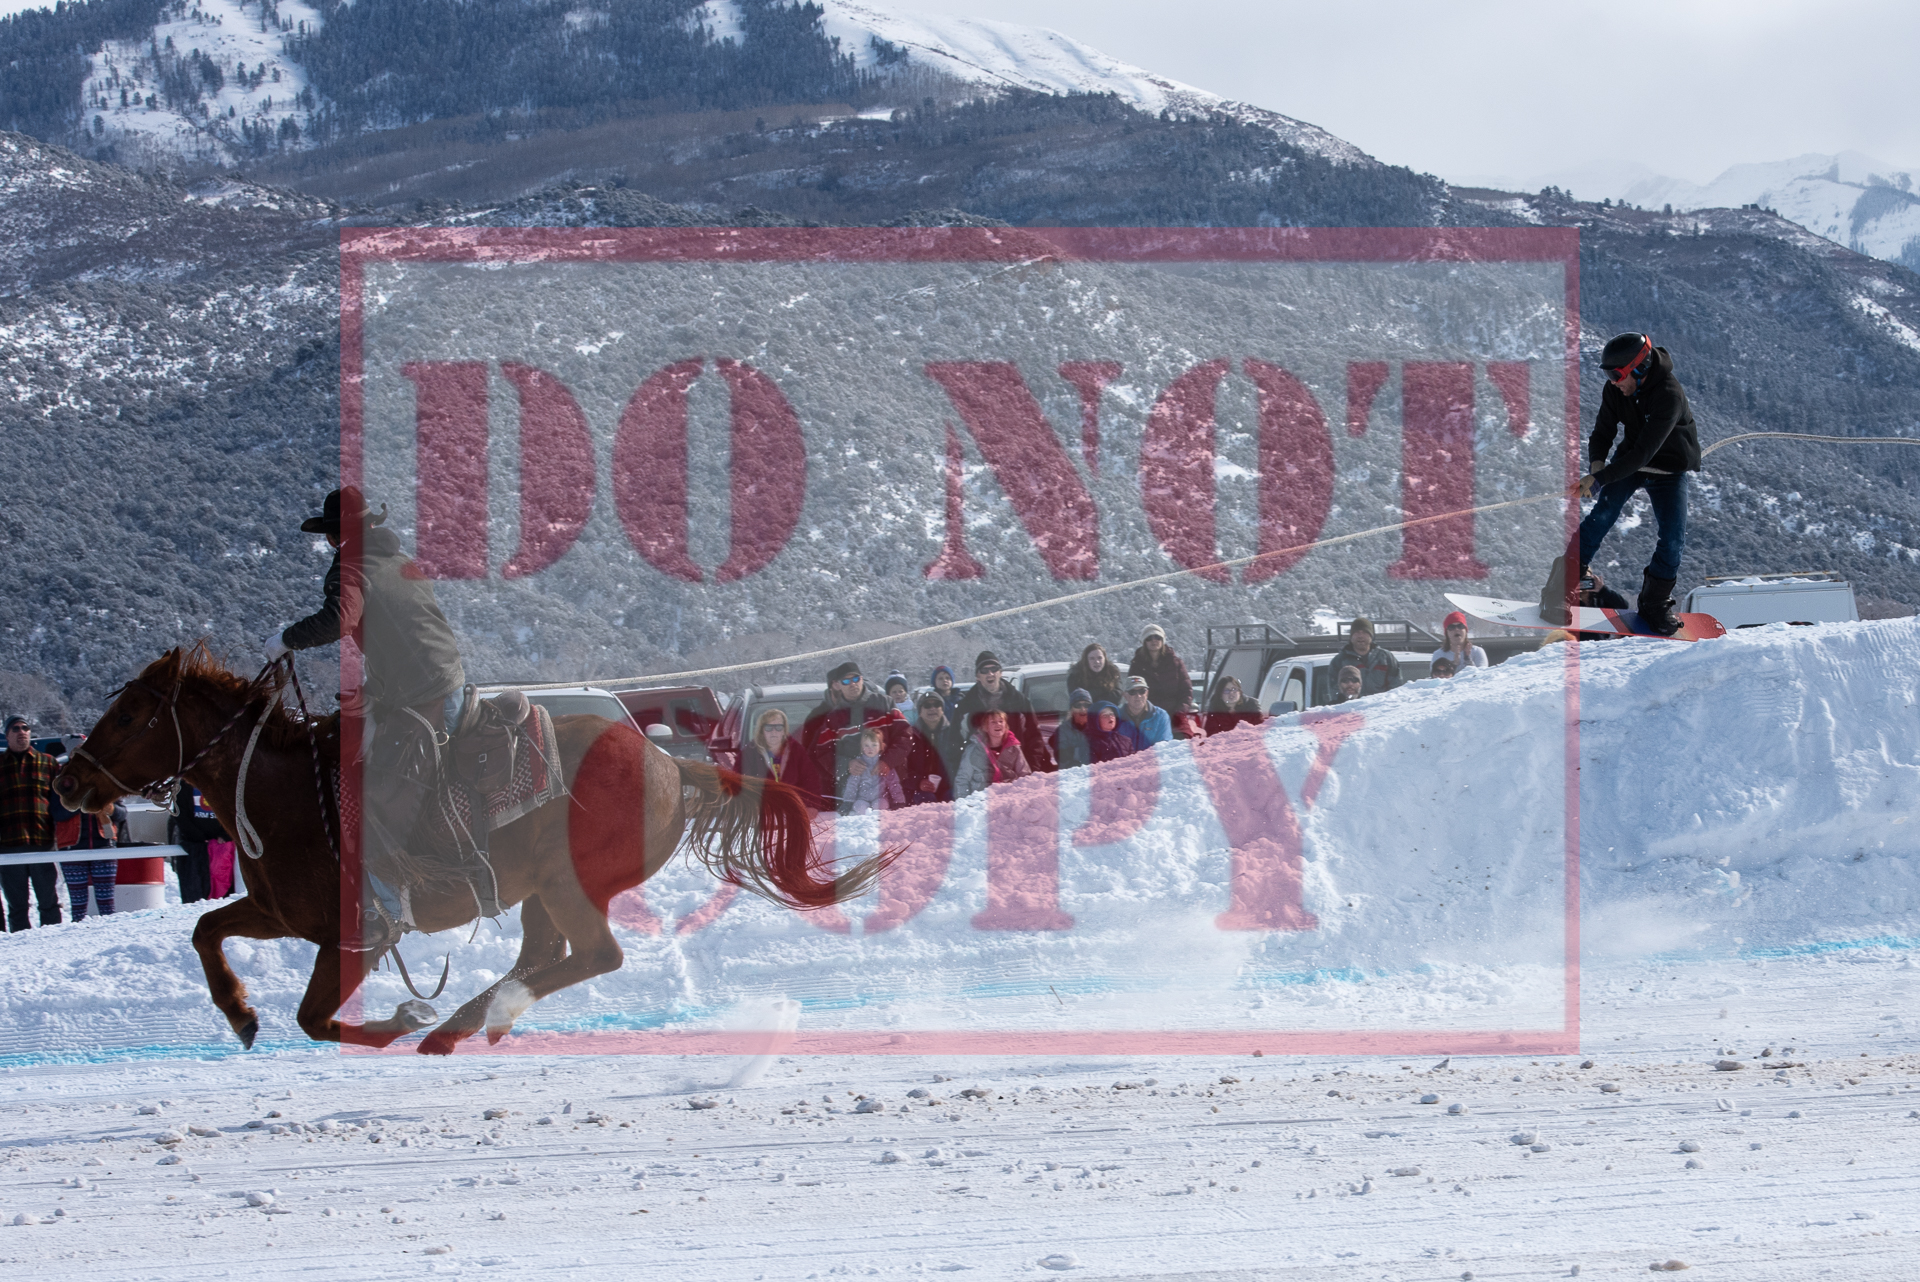 - JW Goode - Snowboard 10